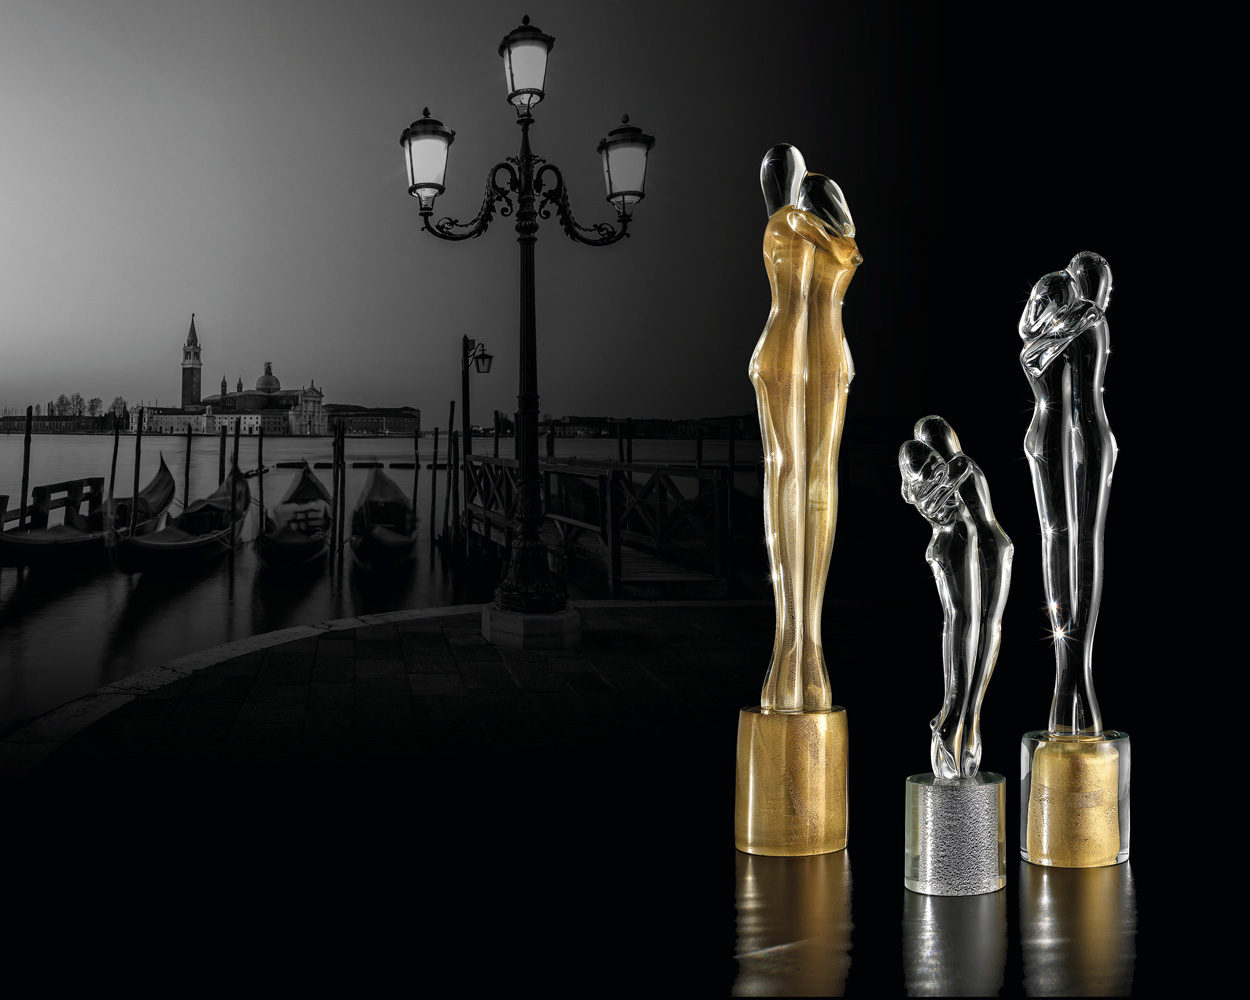 Amanti oro - Amanti trasparente argento - Amanti trasparente oro